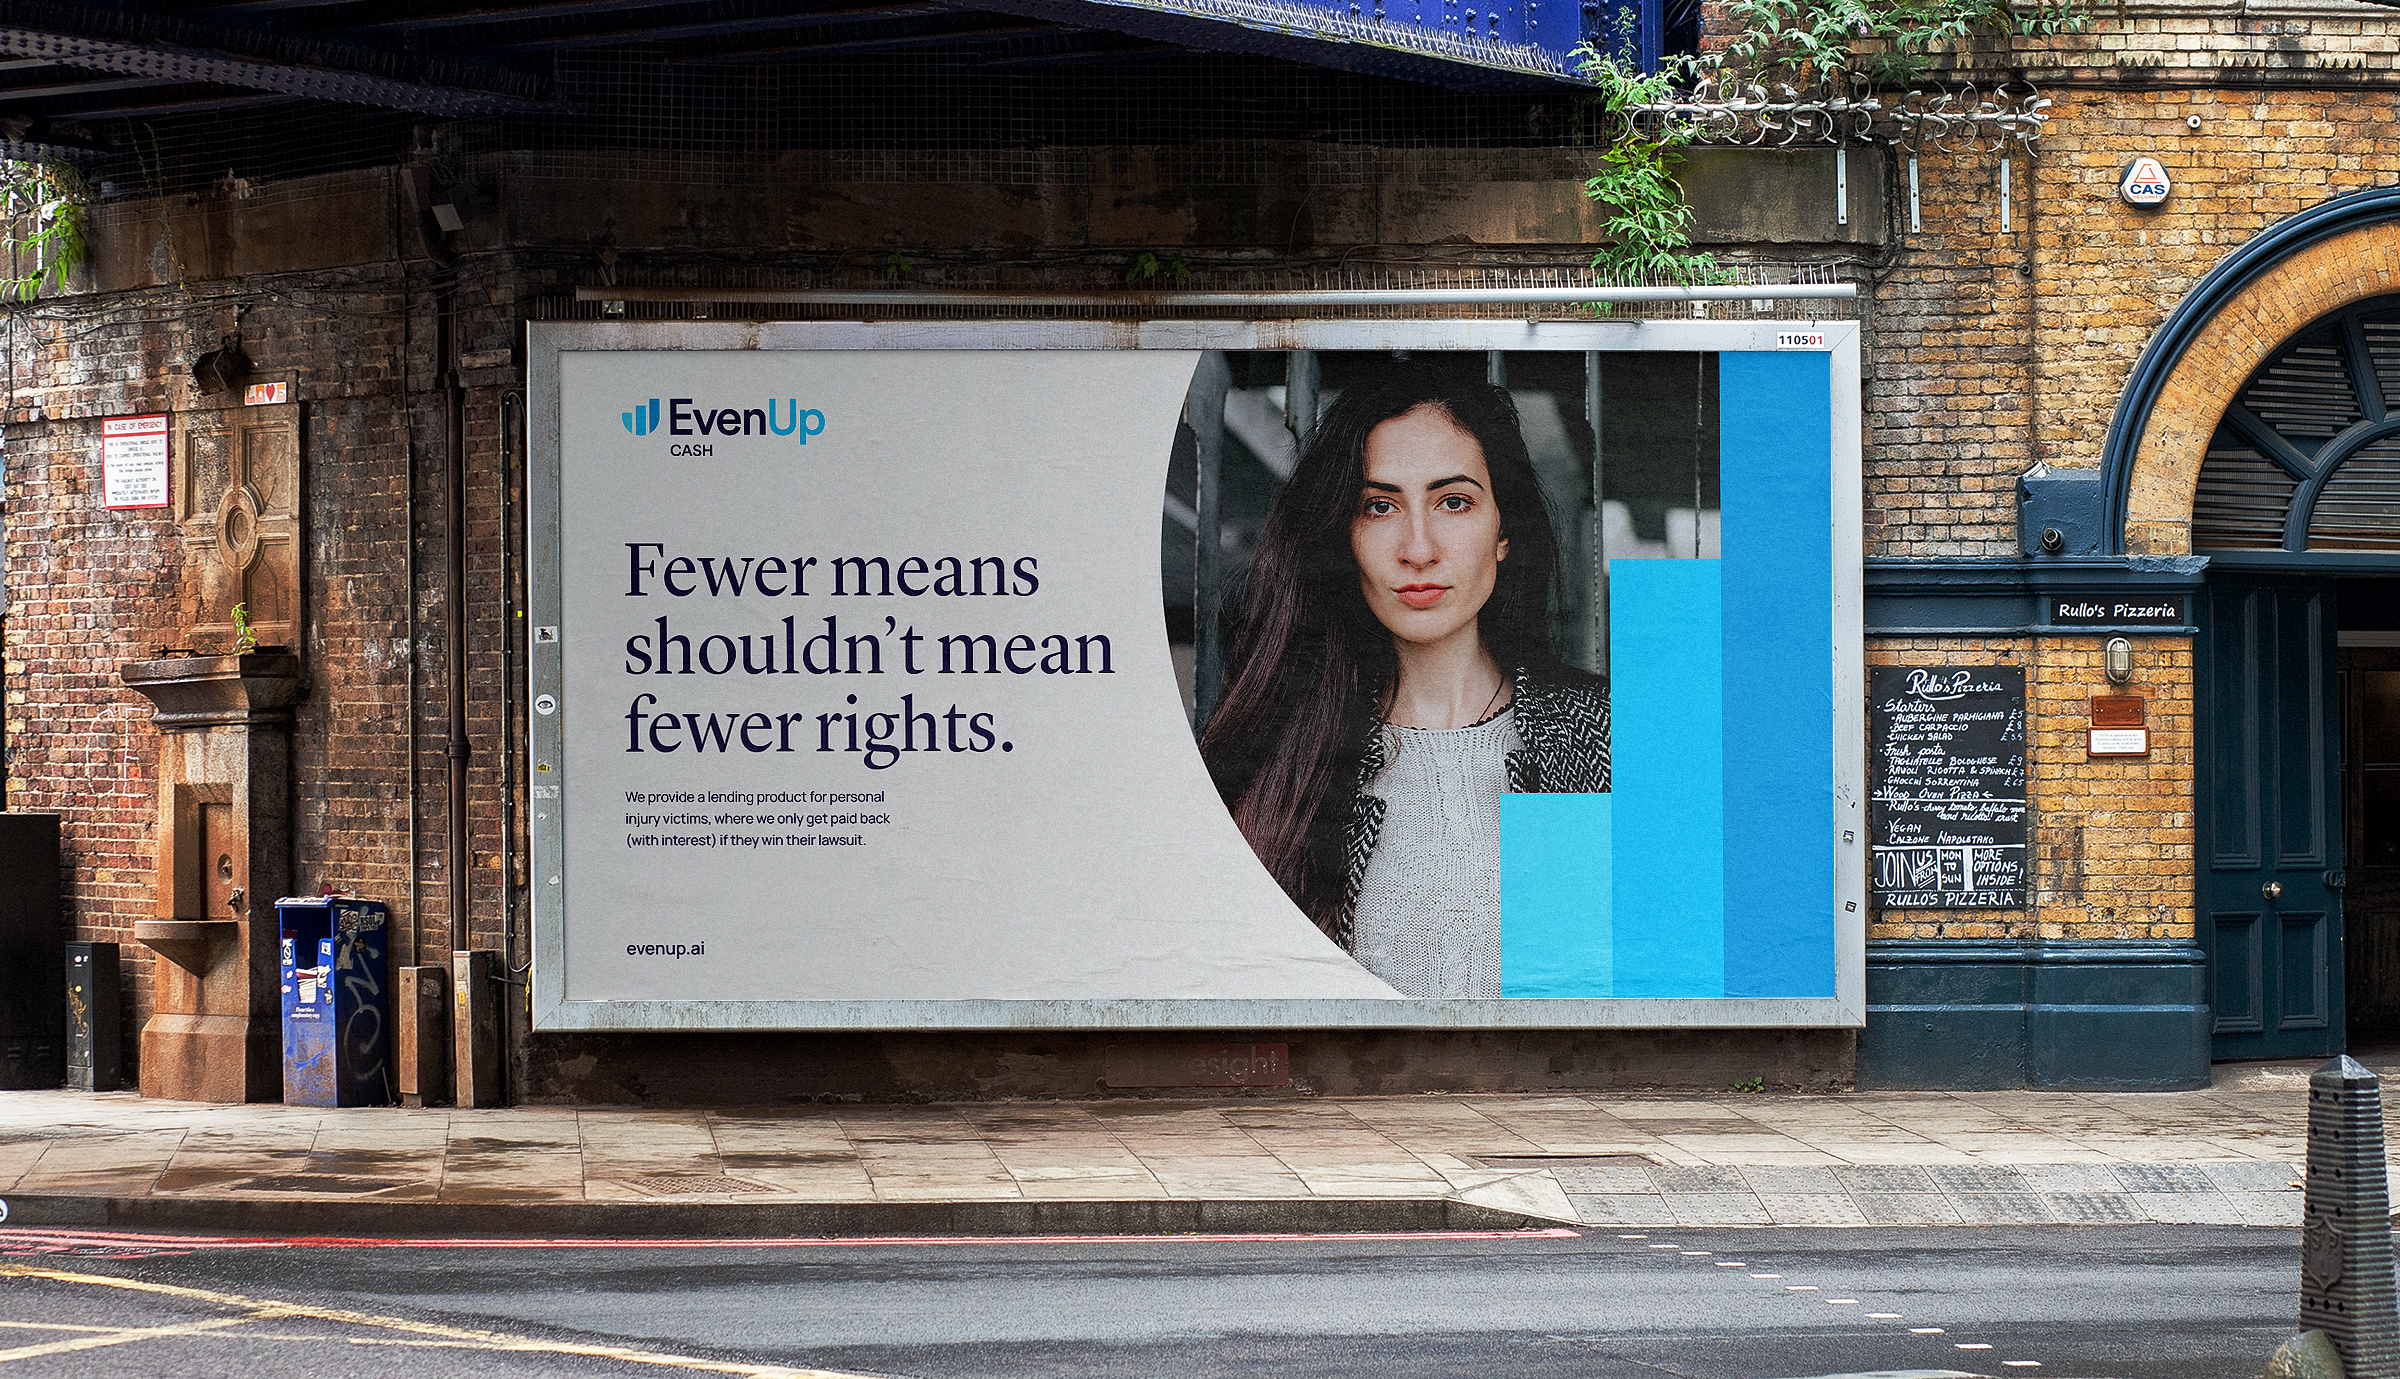 EvenUp brand marketing billboard application